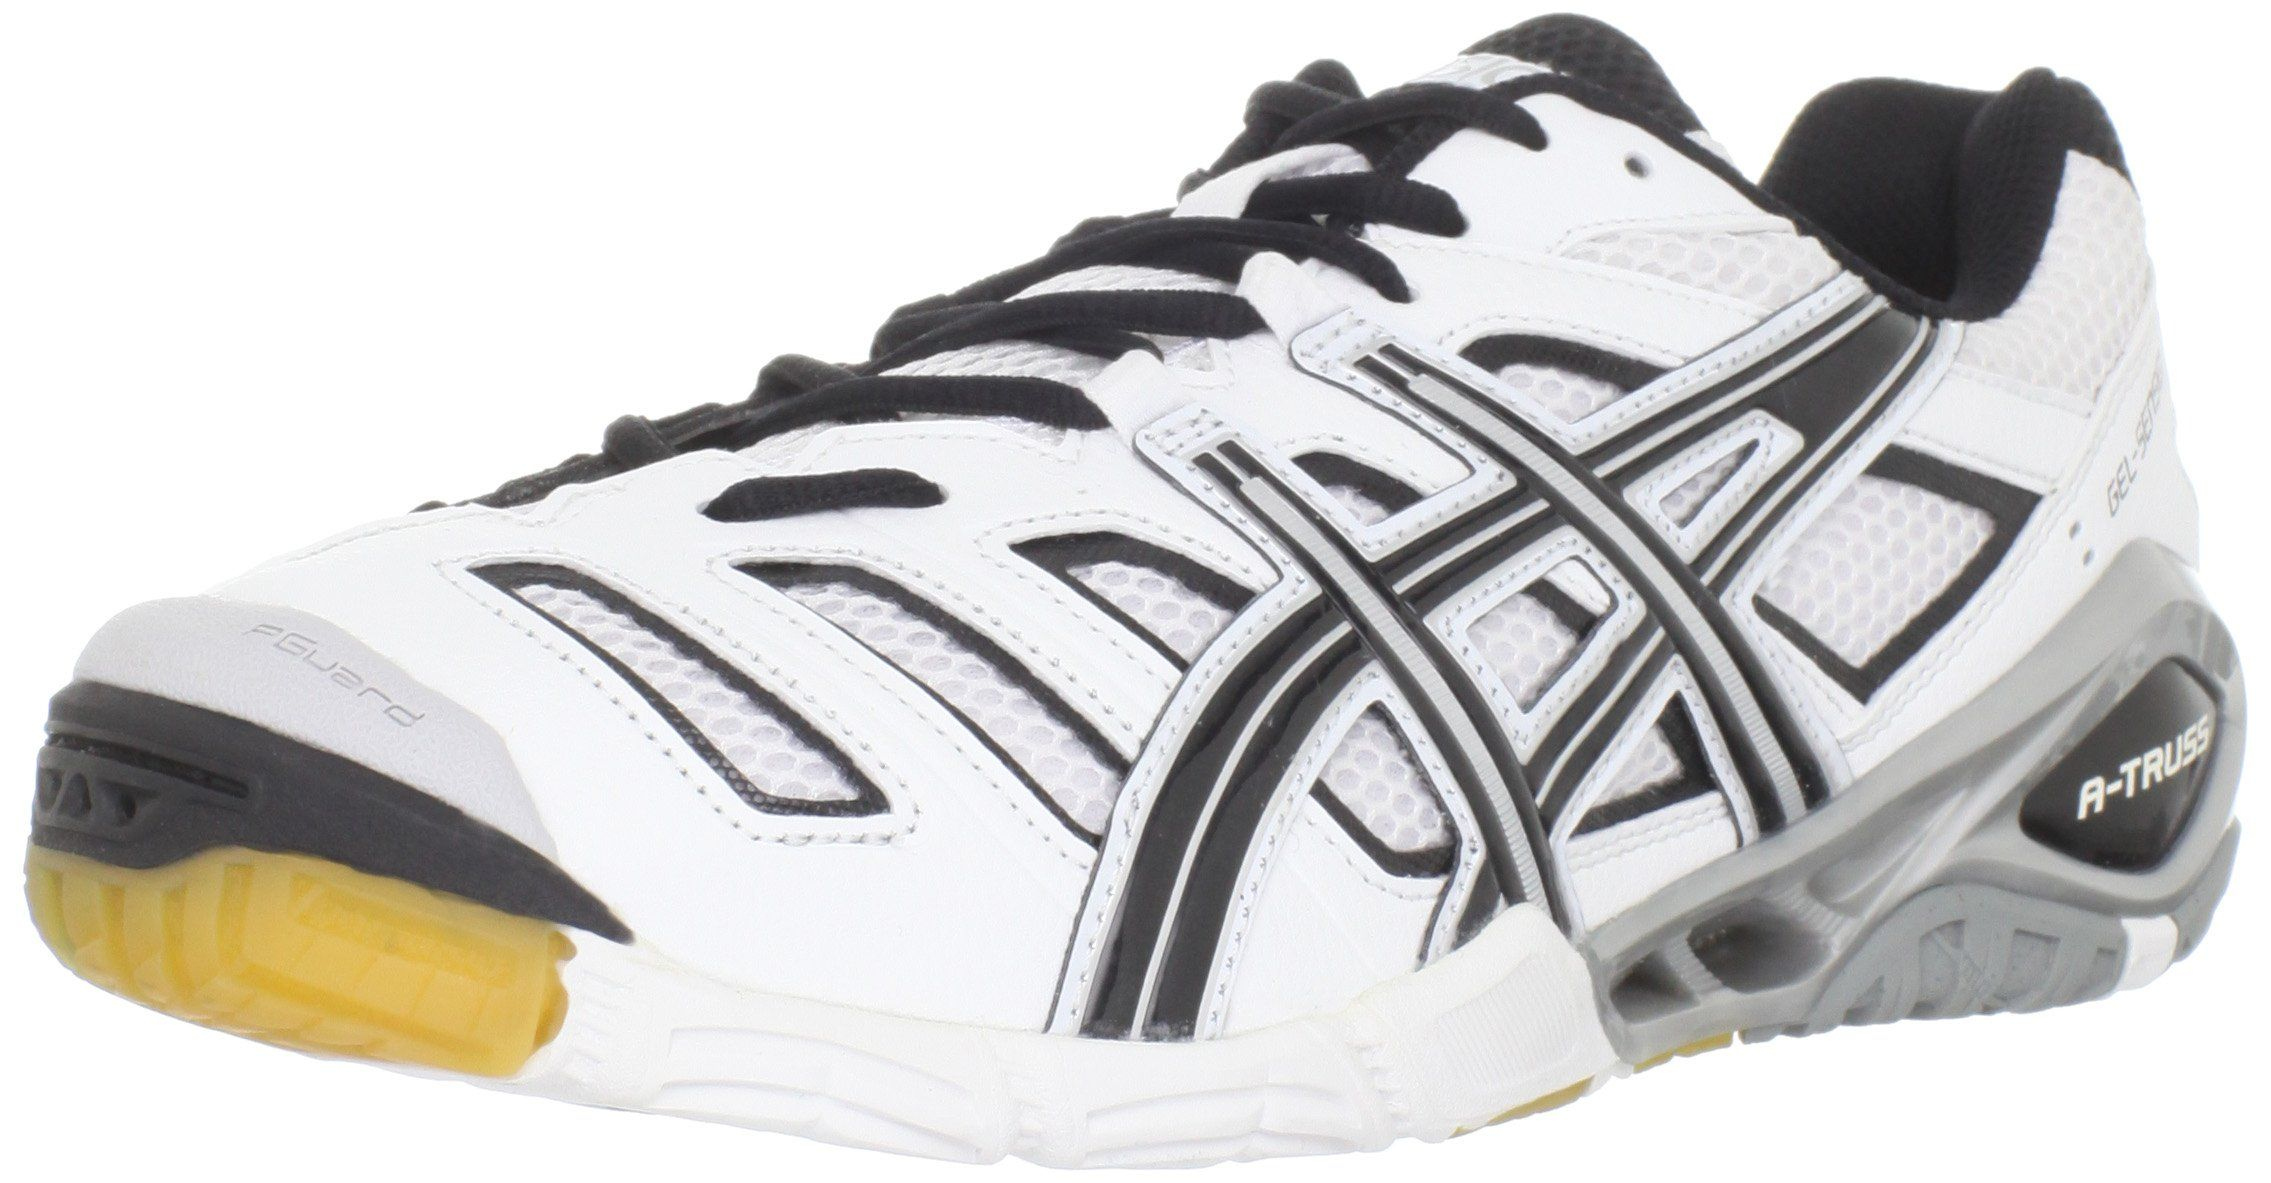 ASICS Men's GEL-Sensei 4 Volleyball Shoe,White/Black/Silver,6 M US ...